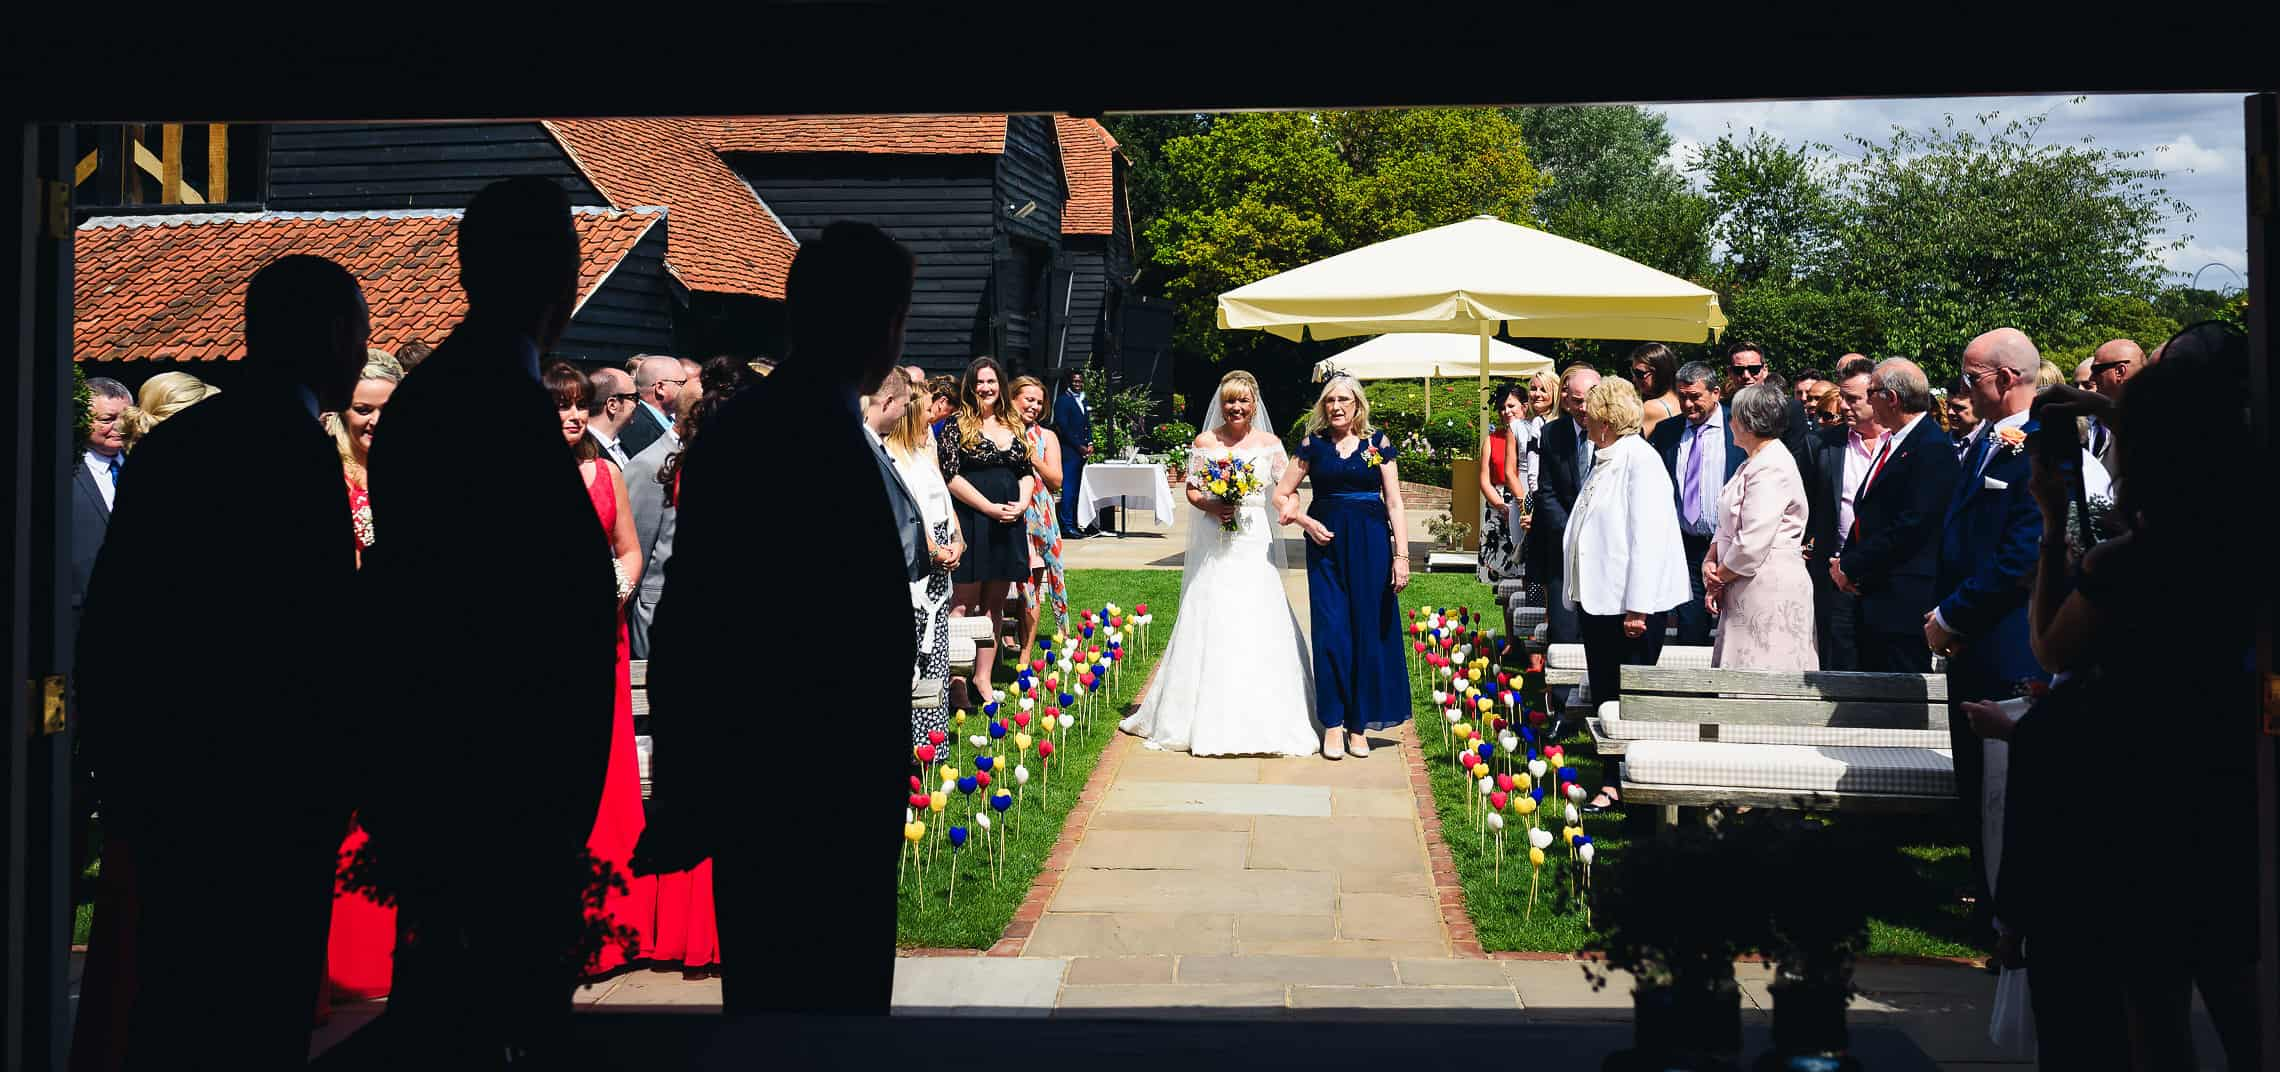 blake_hall_wedding_bc_justin_bailey_photography_023